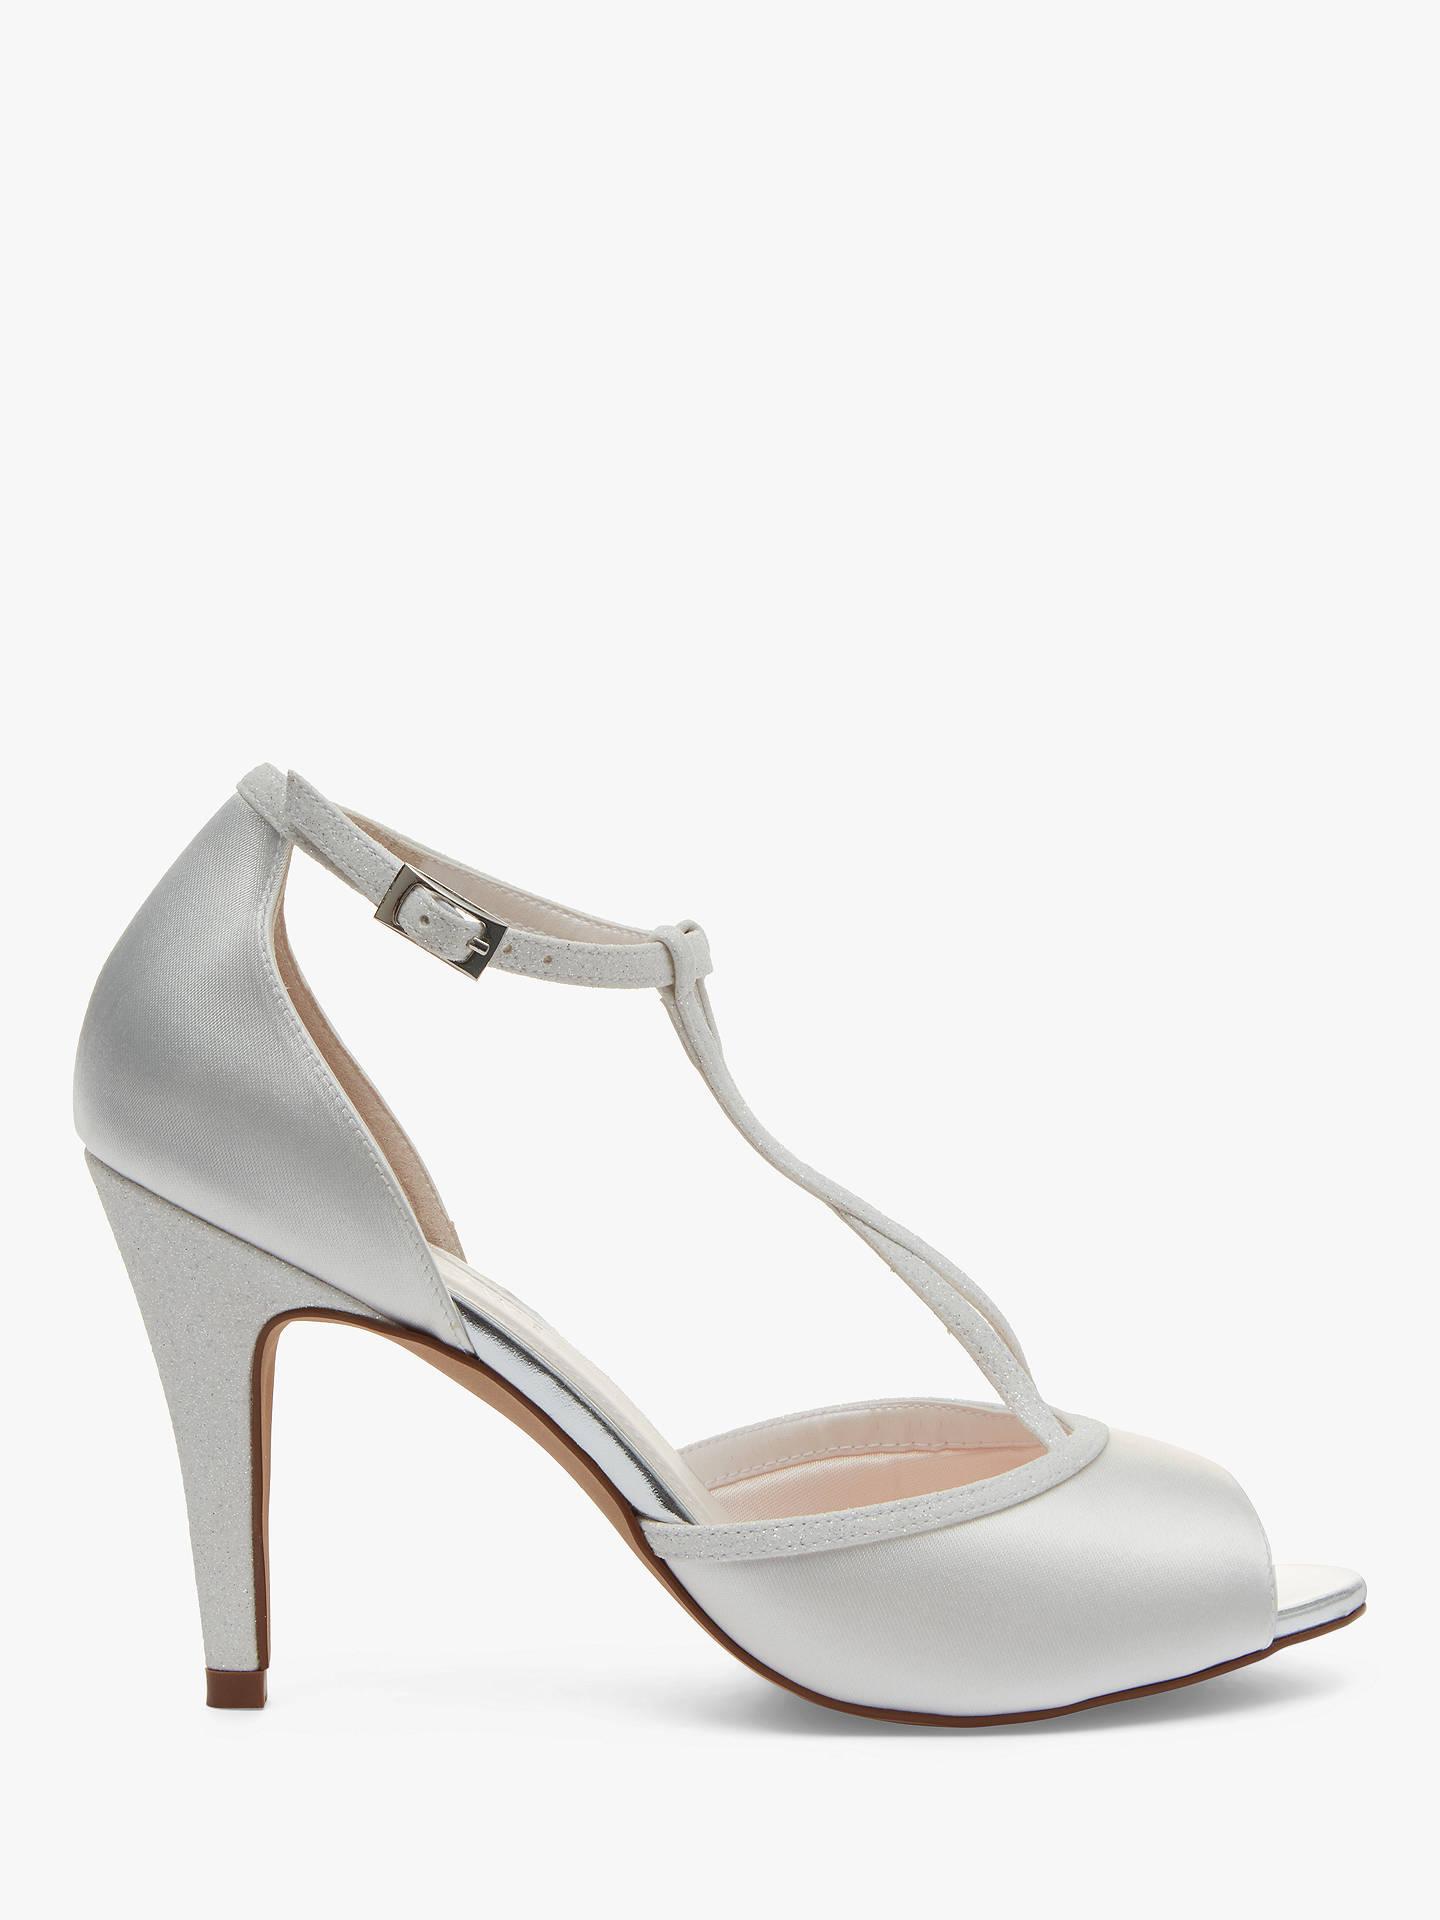 BuyRainbow Club Gigi Peep Toe Sandals d5e4ce415e66a